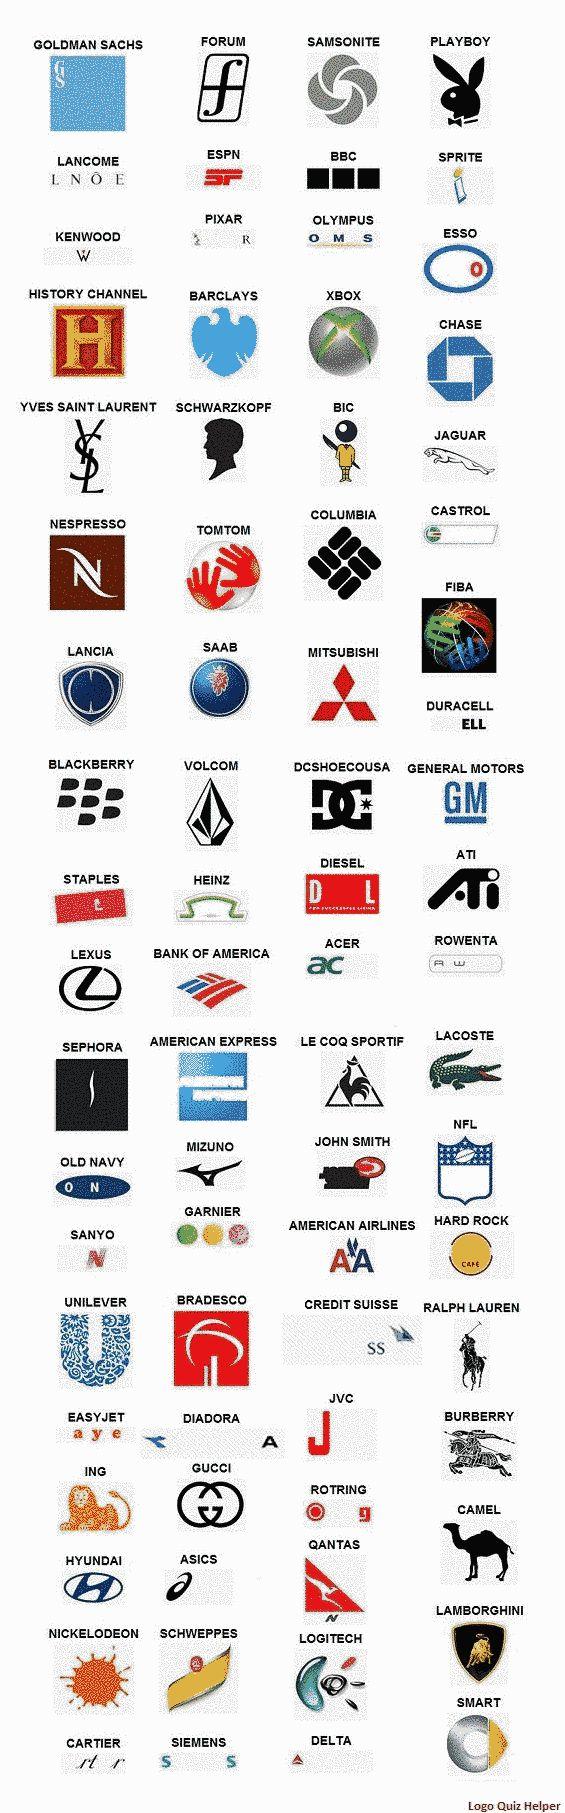 logo quiz answers level 5